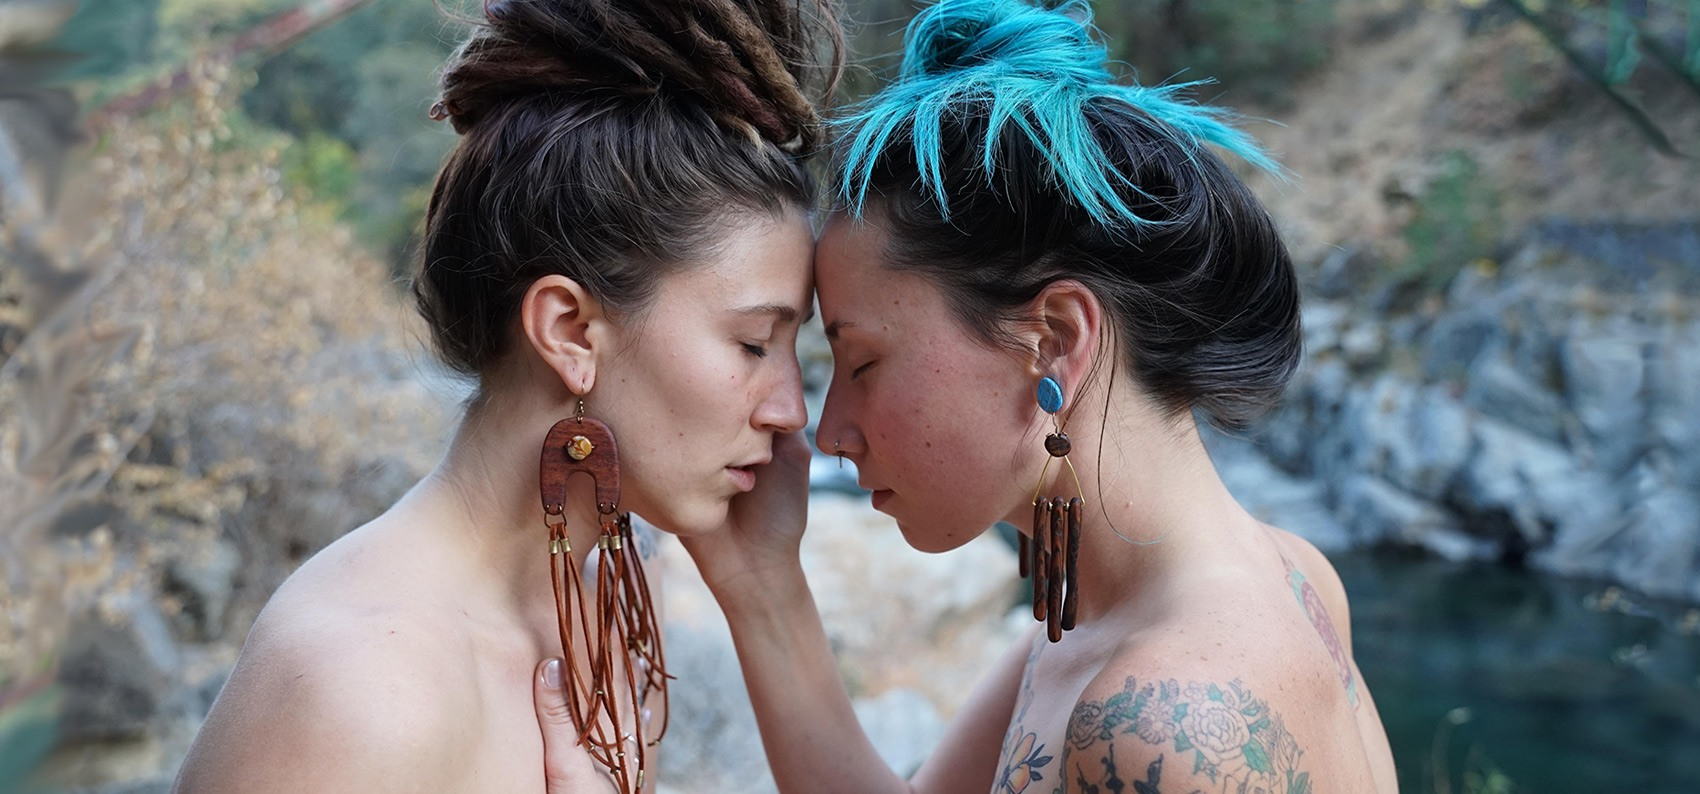 Handmade wooden earrings, USA by TatianaAshna